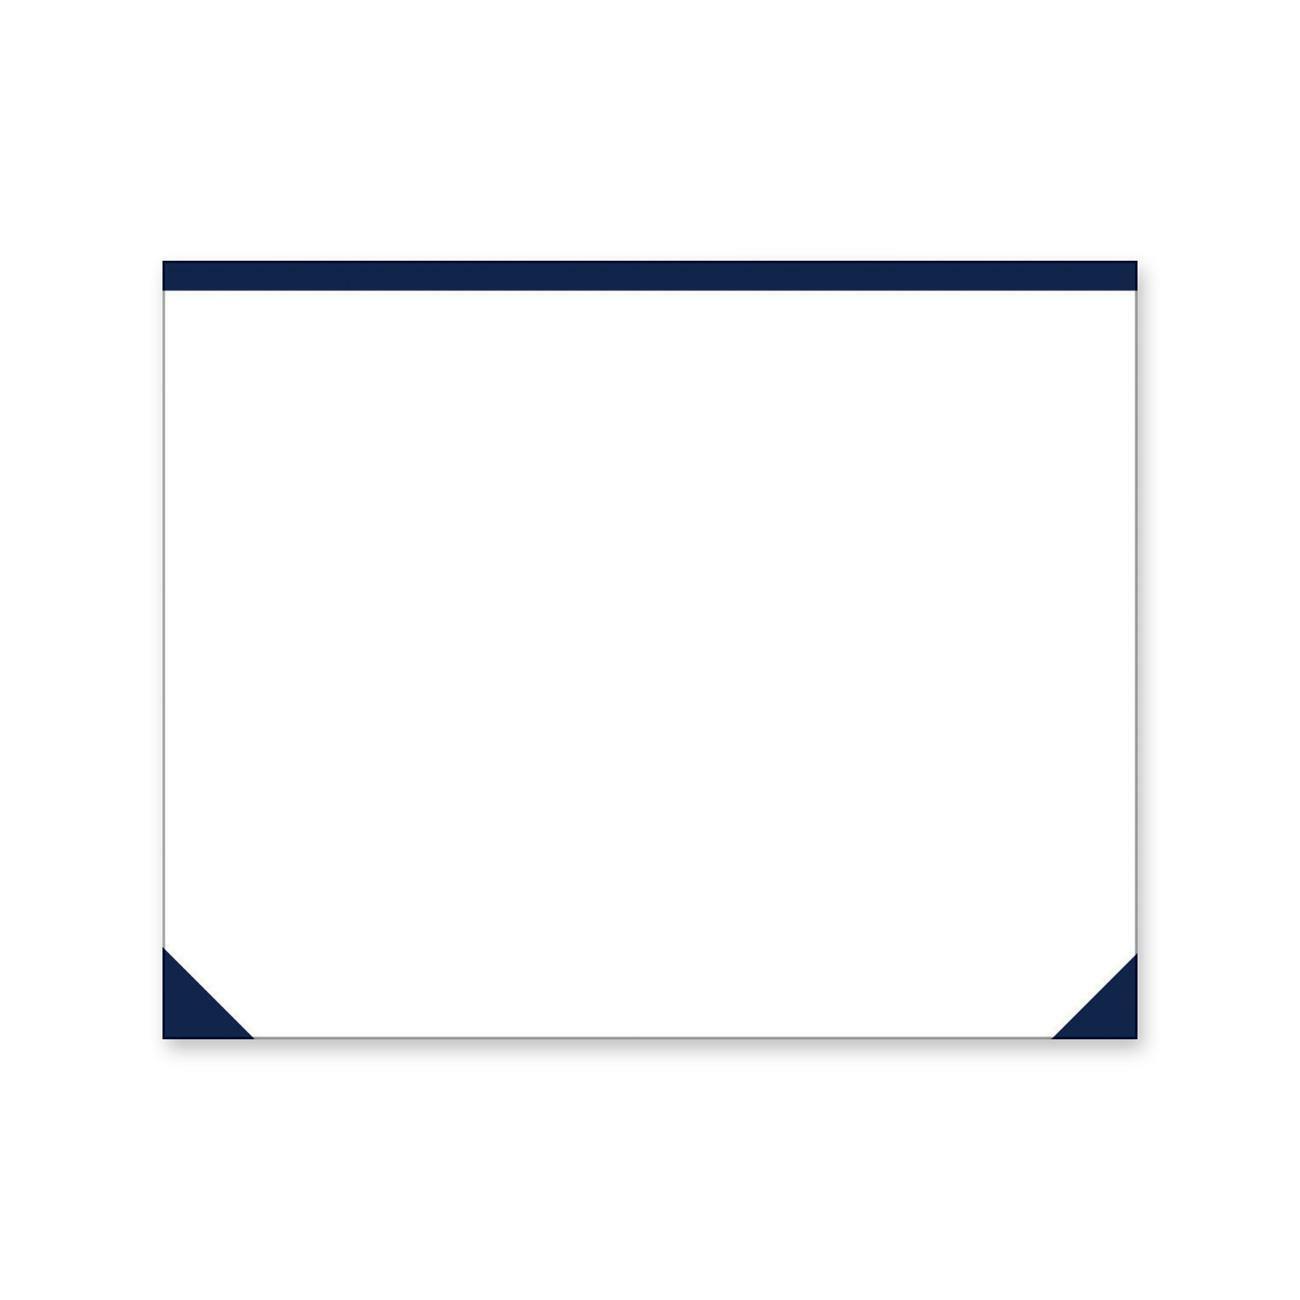 Fine Blueline Eco Plain Desk Pad Rectangle 21 75 552 45 Mm Width X 17 431 80 Mm Depth 50 Sheets White Home Interior And Landscaping Ymoonbapapsignezvosmurscom